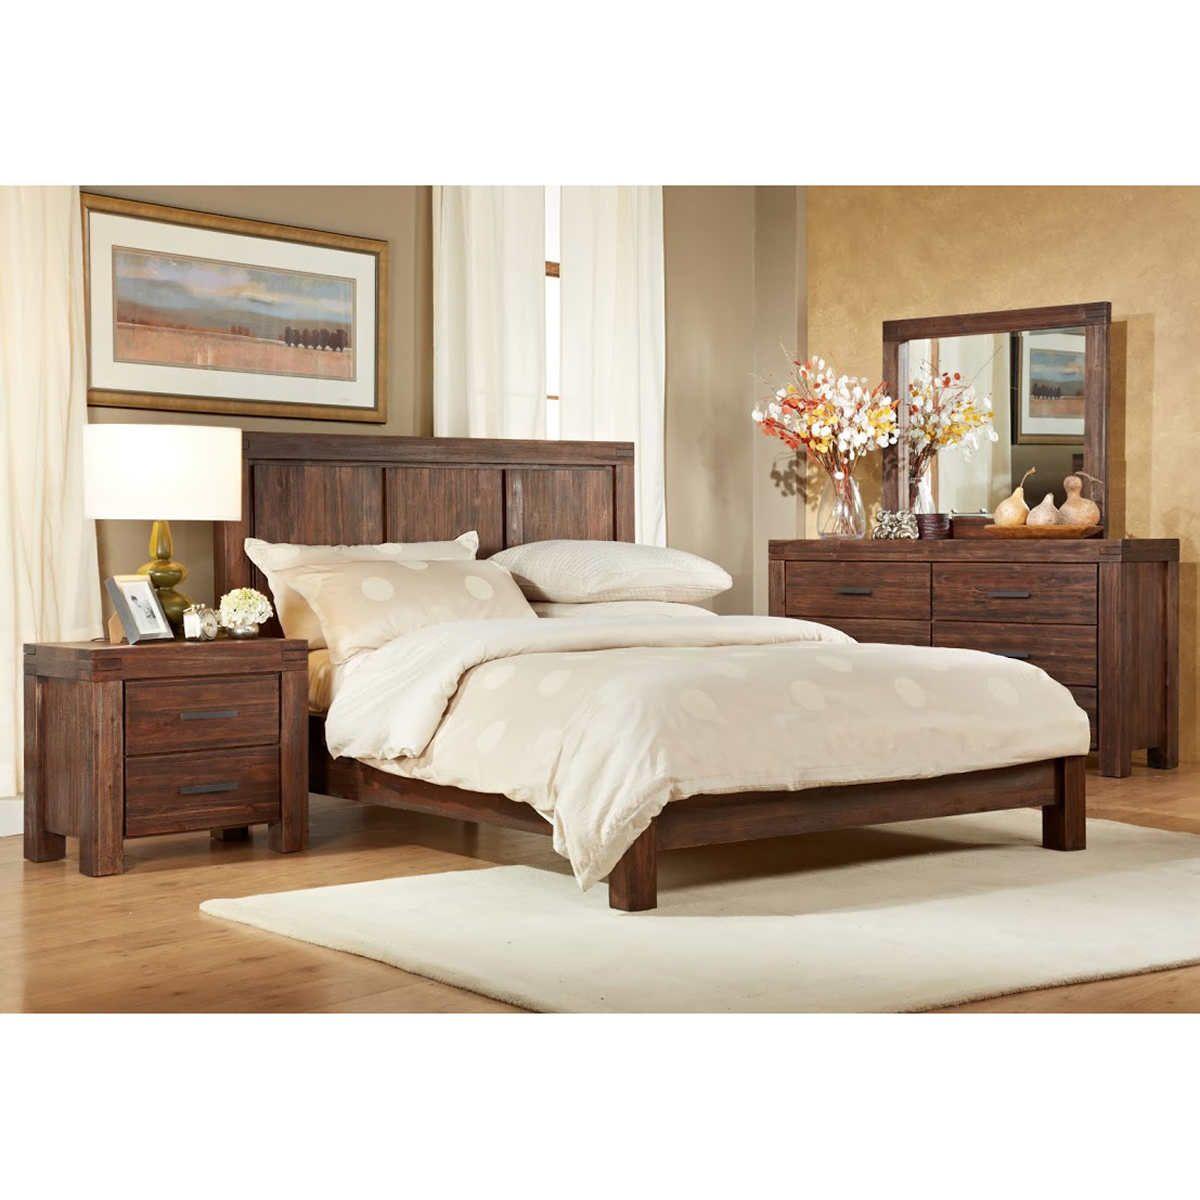 Mellina 5 Piece Cal King Bedroom Set Full Bedroom Furniture Sets King Bedroom Sets Rustic Bedroom Design 5 piece bedroom set king